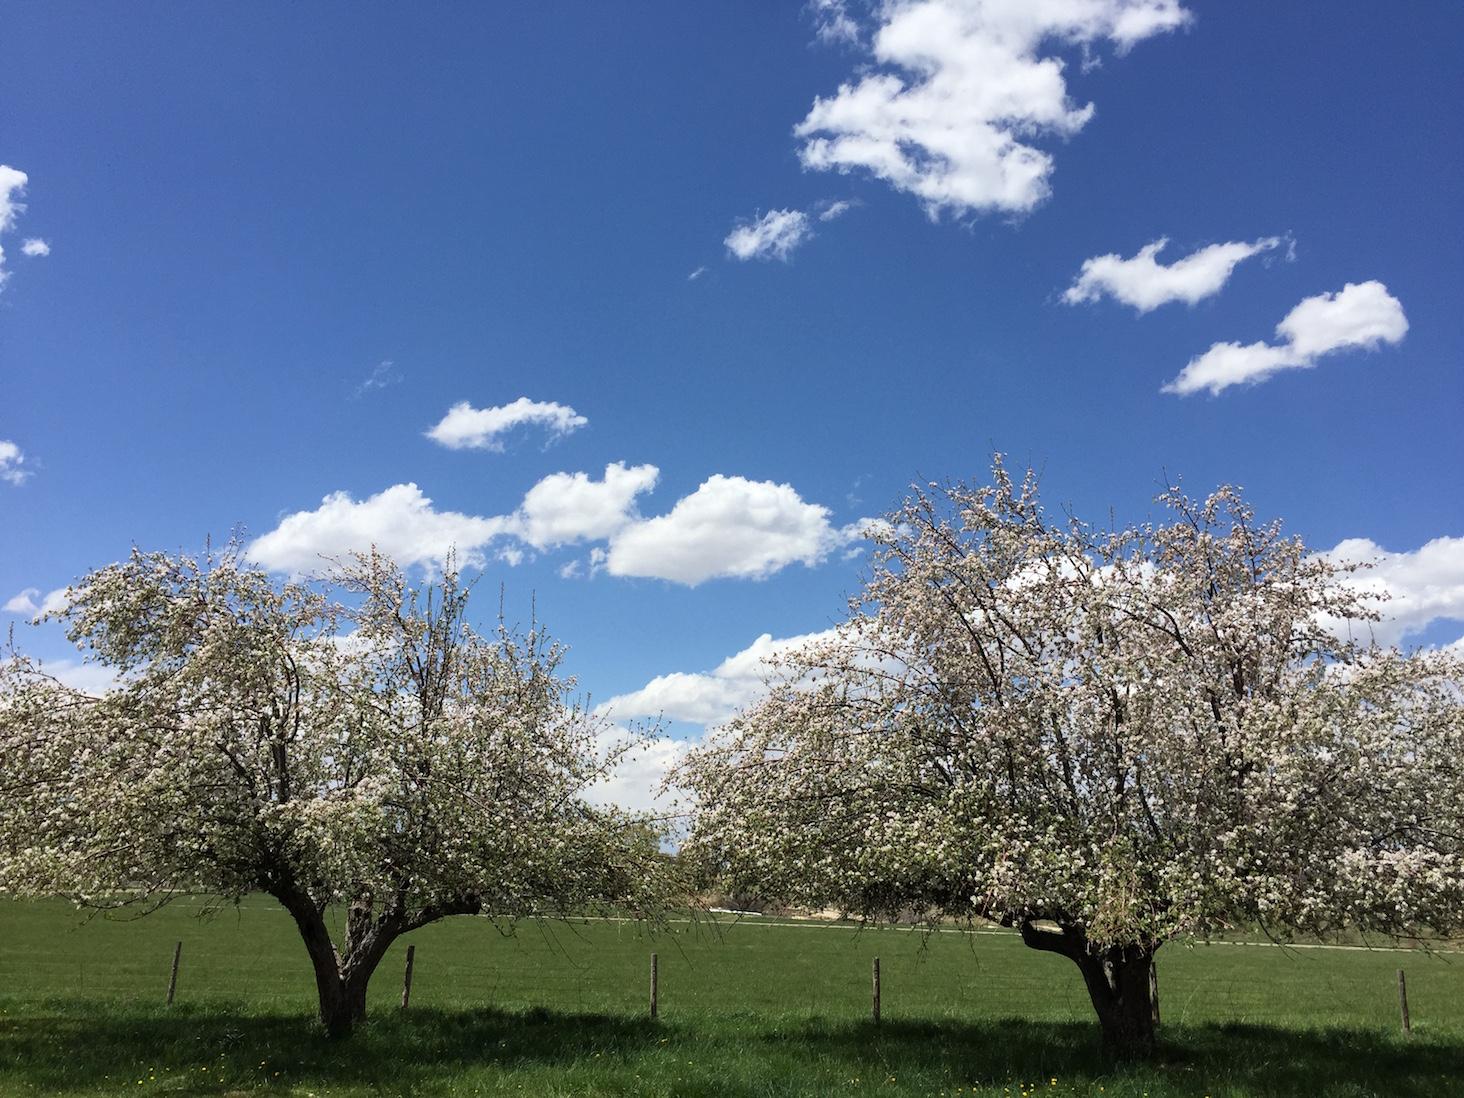 Historic Montezuma County Apple trees in bloom.